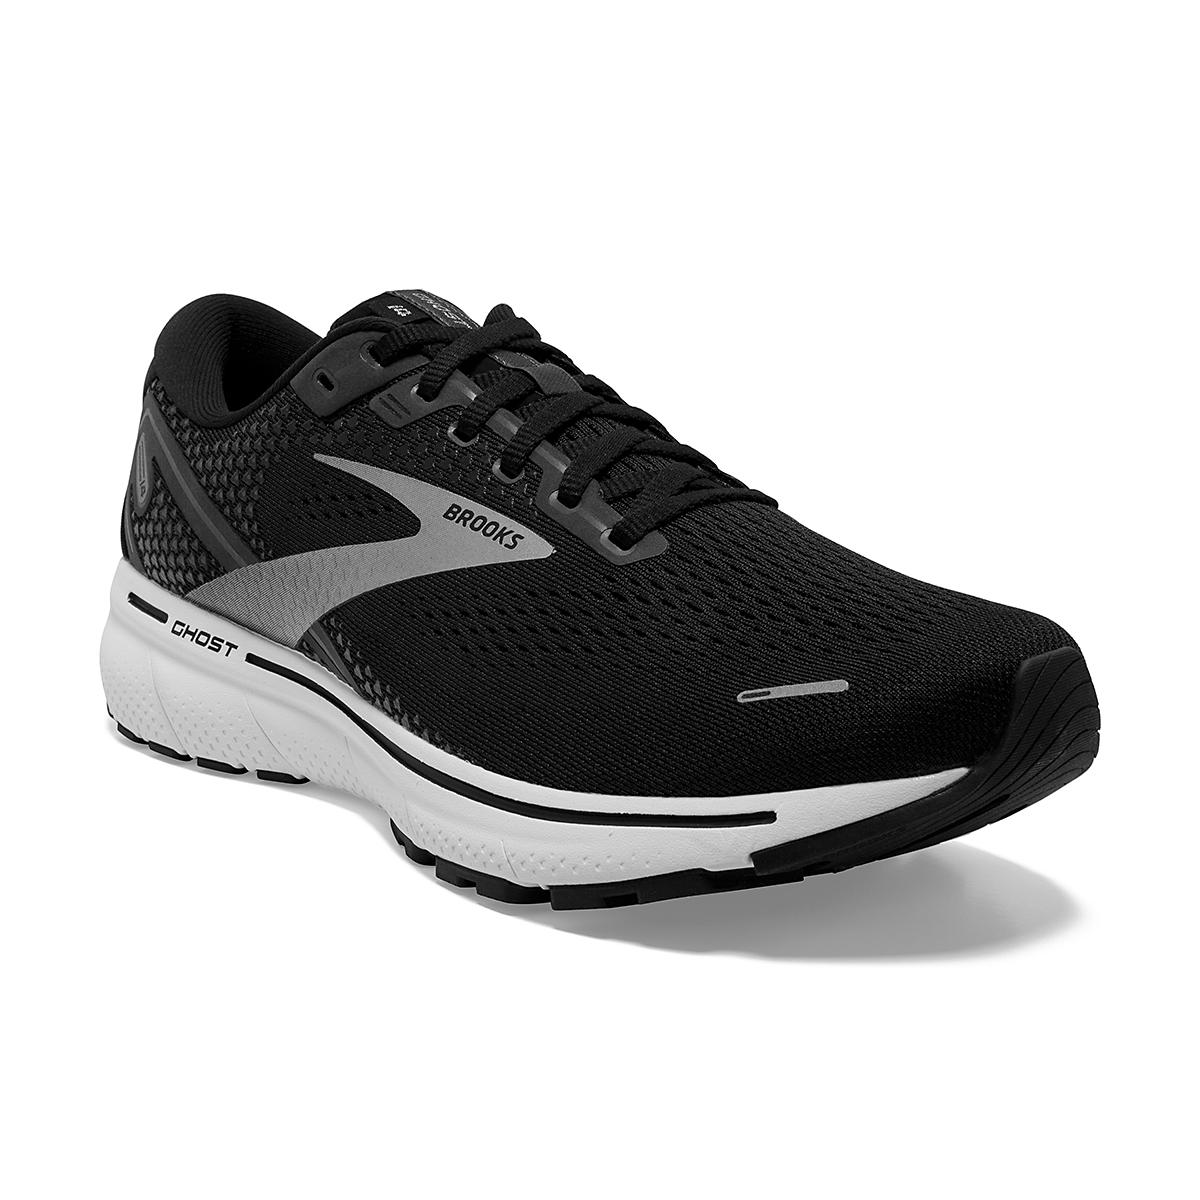 Men's Brooks Ghost 14 Running Shoe - Color: Black/White - Size: 7 - Width: Regular, Black/White, large, image 2